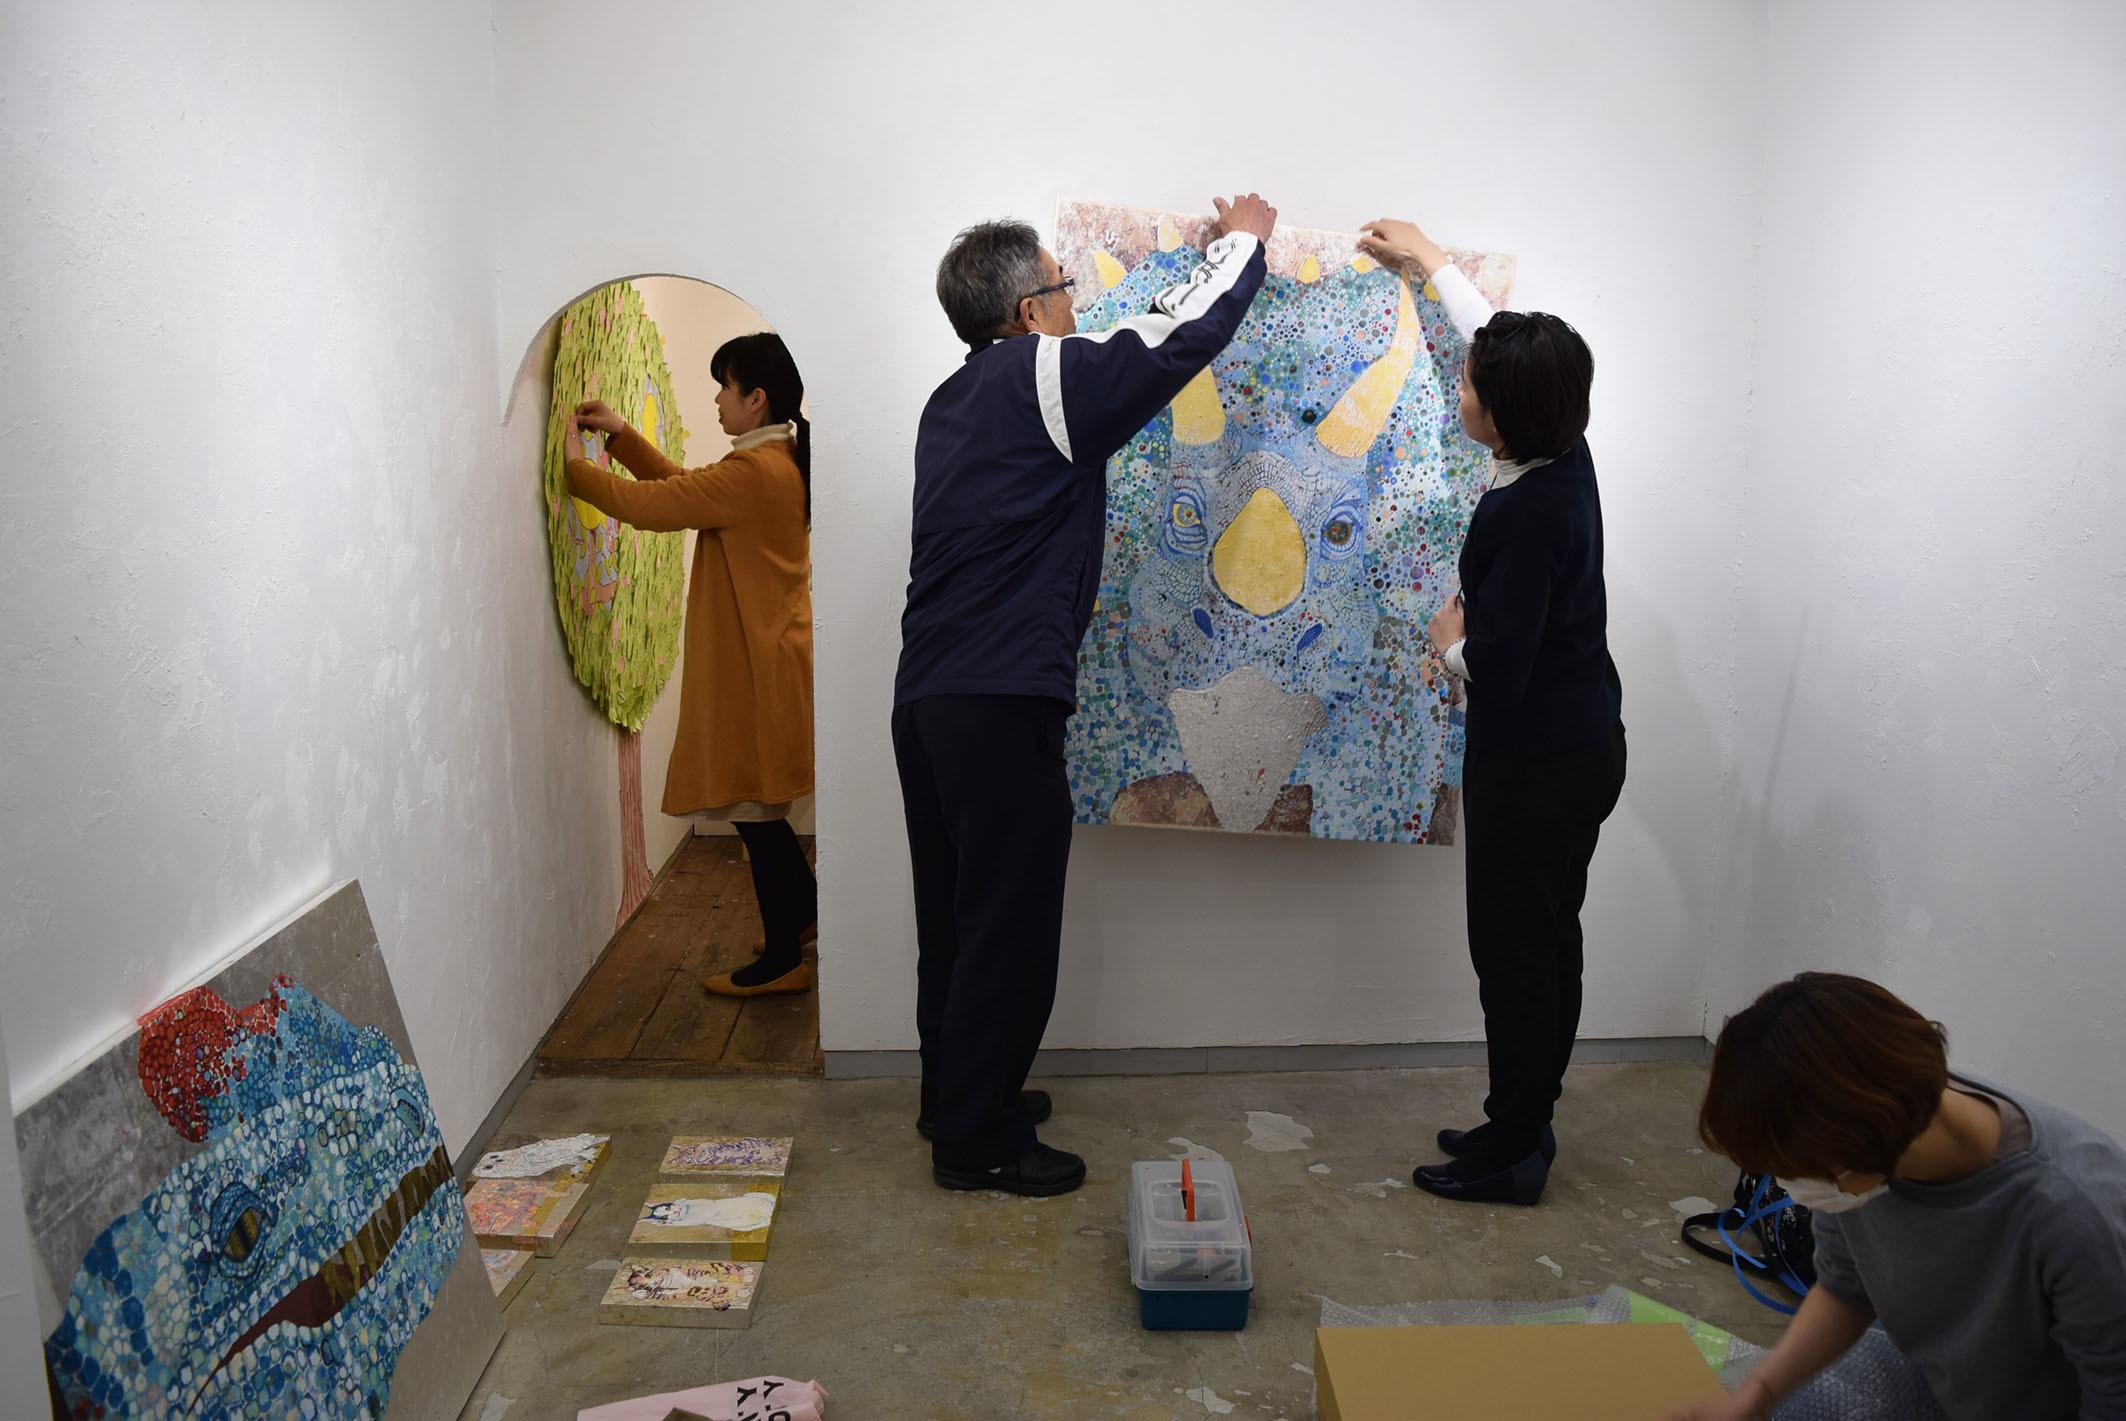 Three Rings 小名木美緒,オオサキケイ,奥山加奈子@搬入_e0272050_14213962.jpg